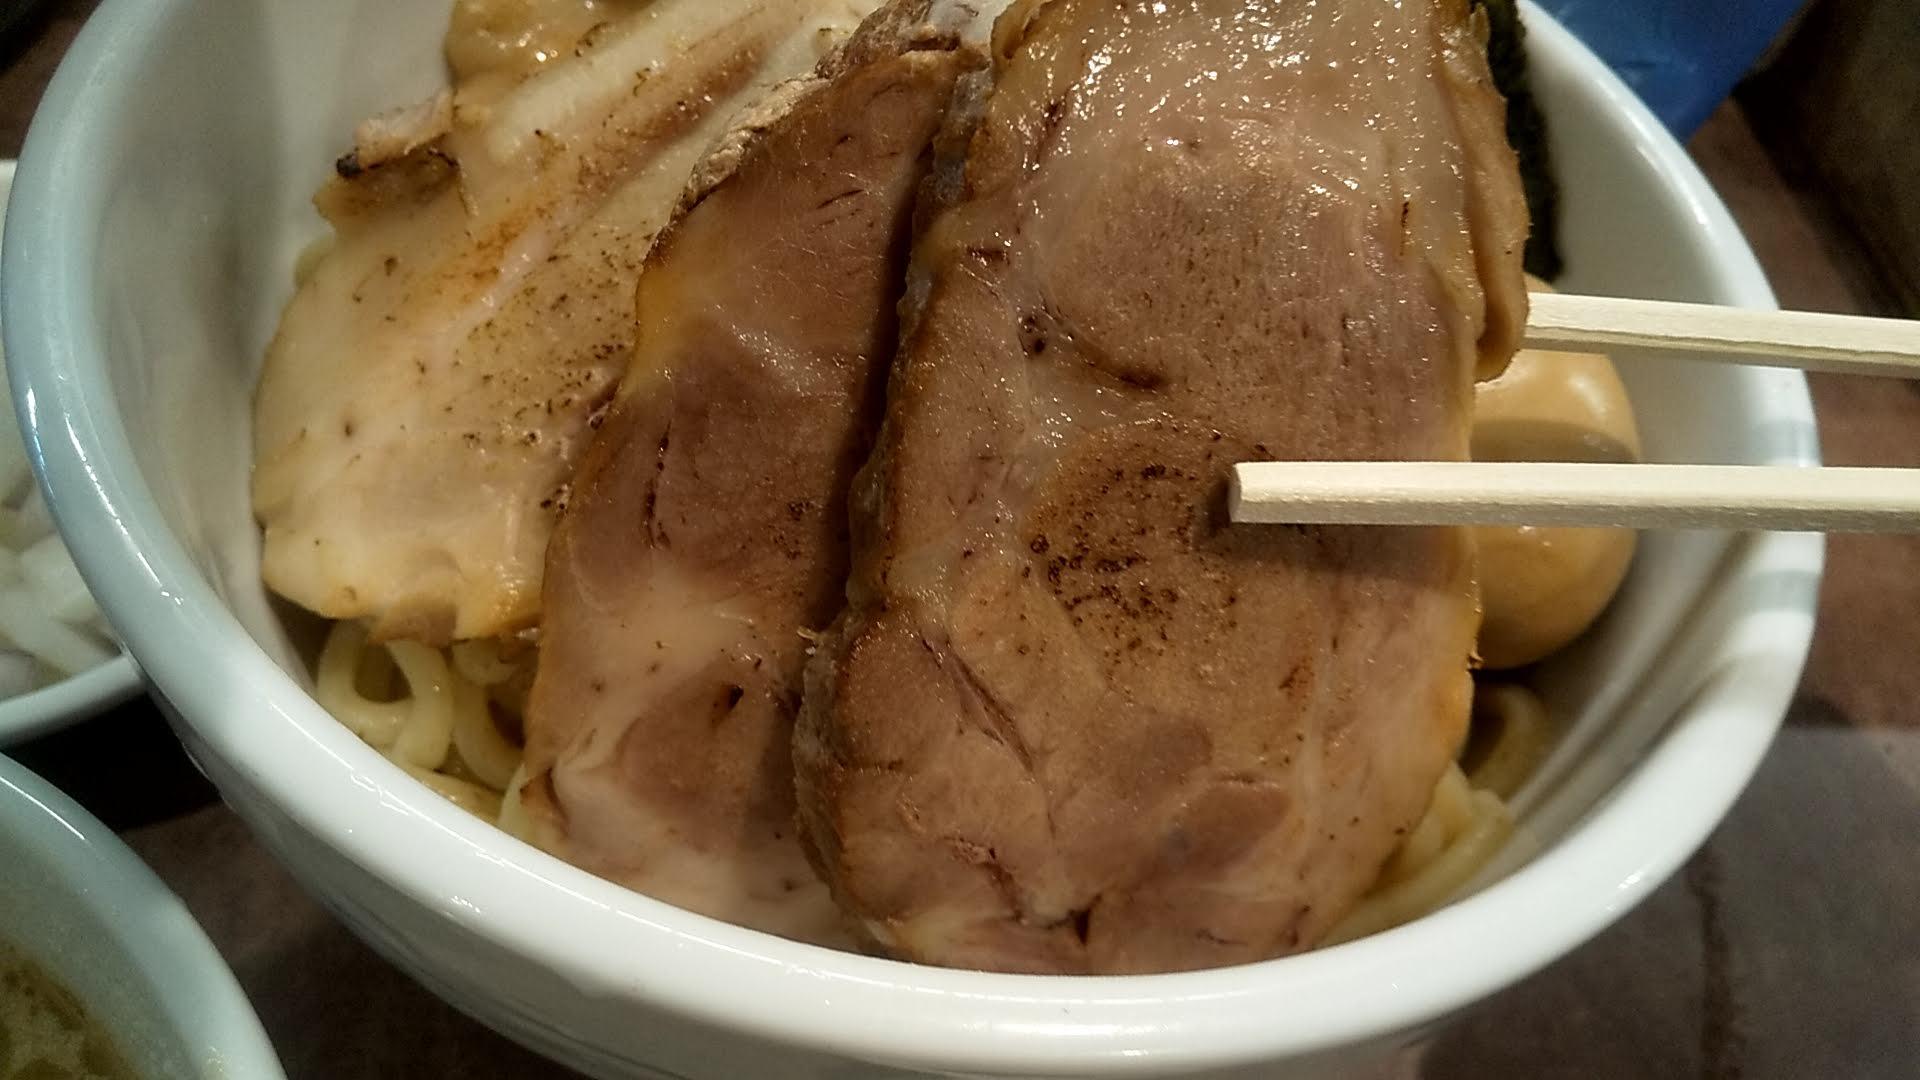 NOODLEVOICEの特製つけ麺のチャーシューアップの写真